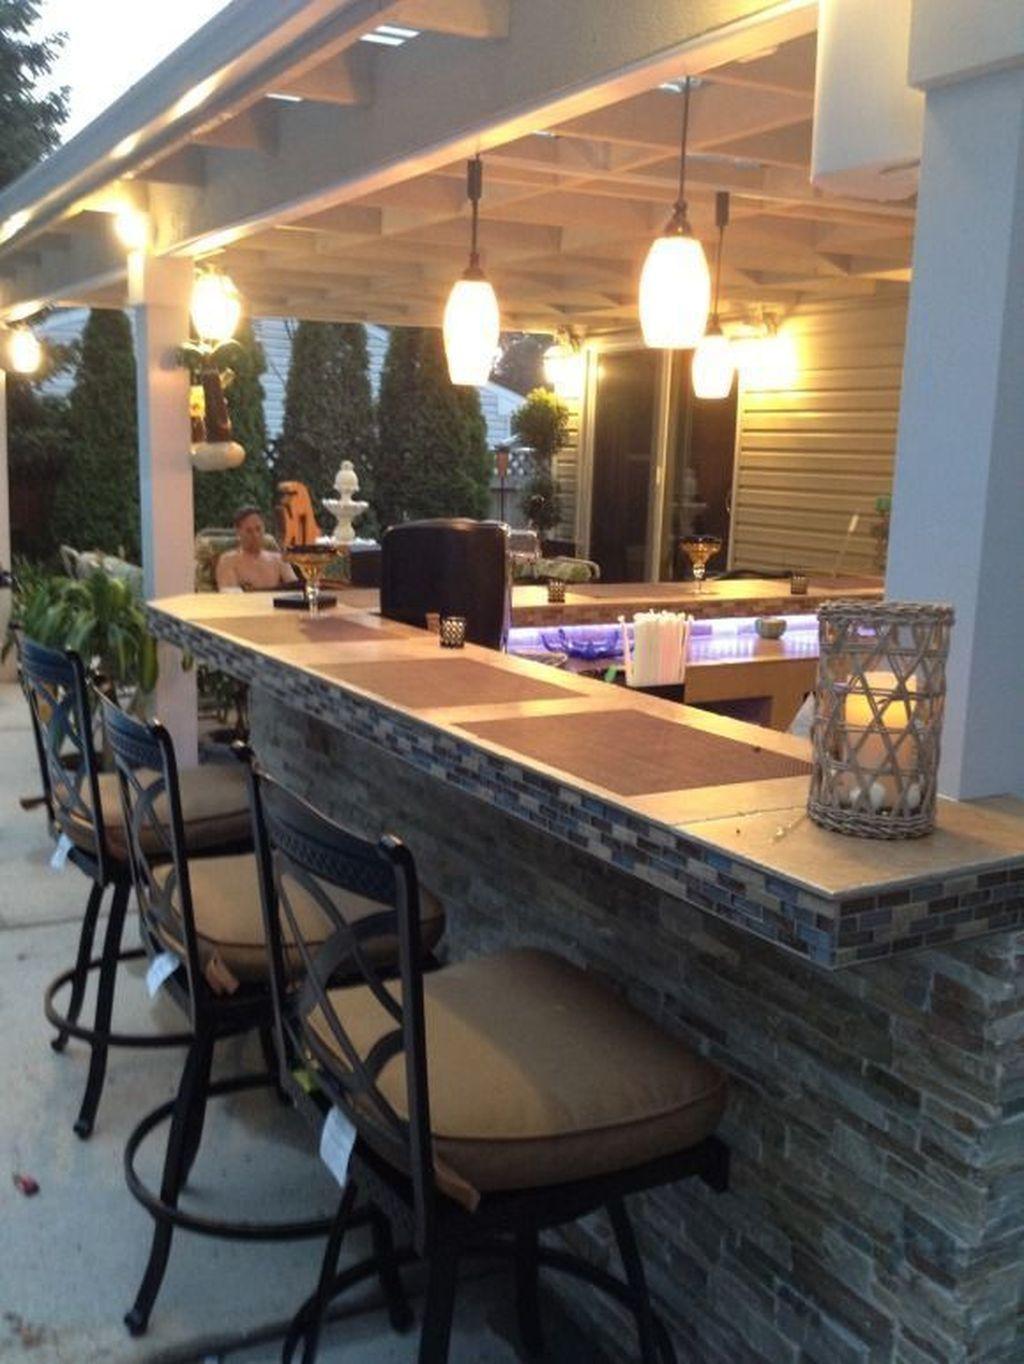 30 fabulous stone bar design ideas for your kitchen